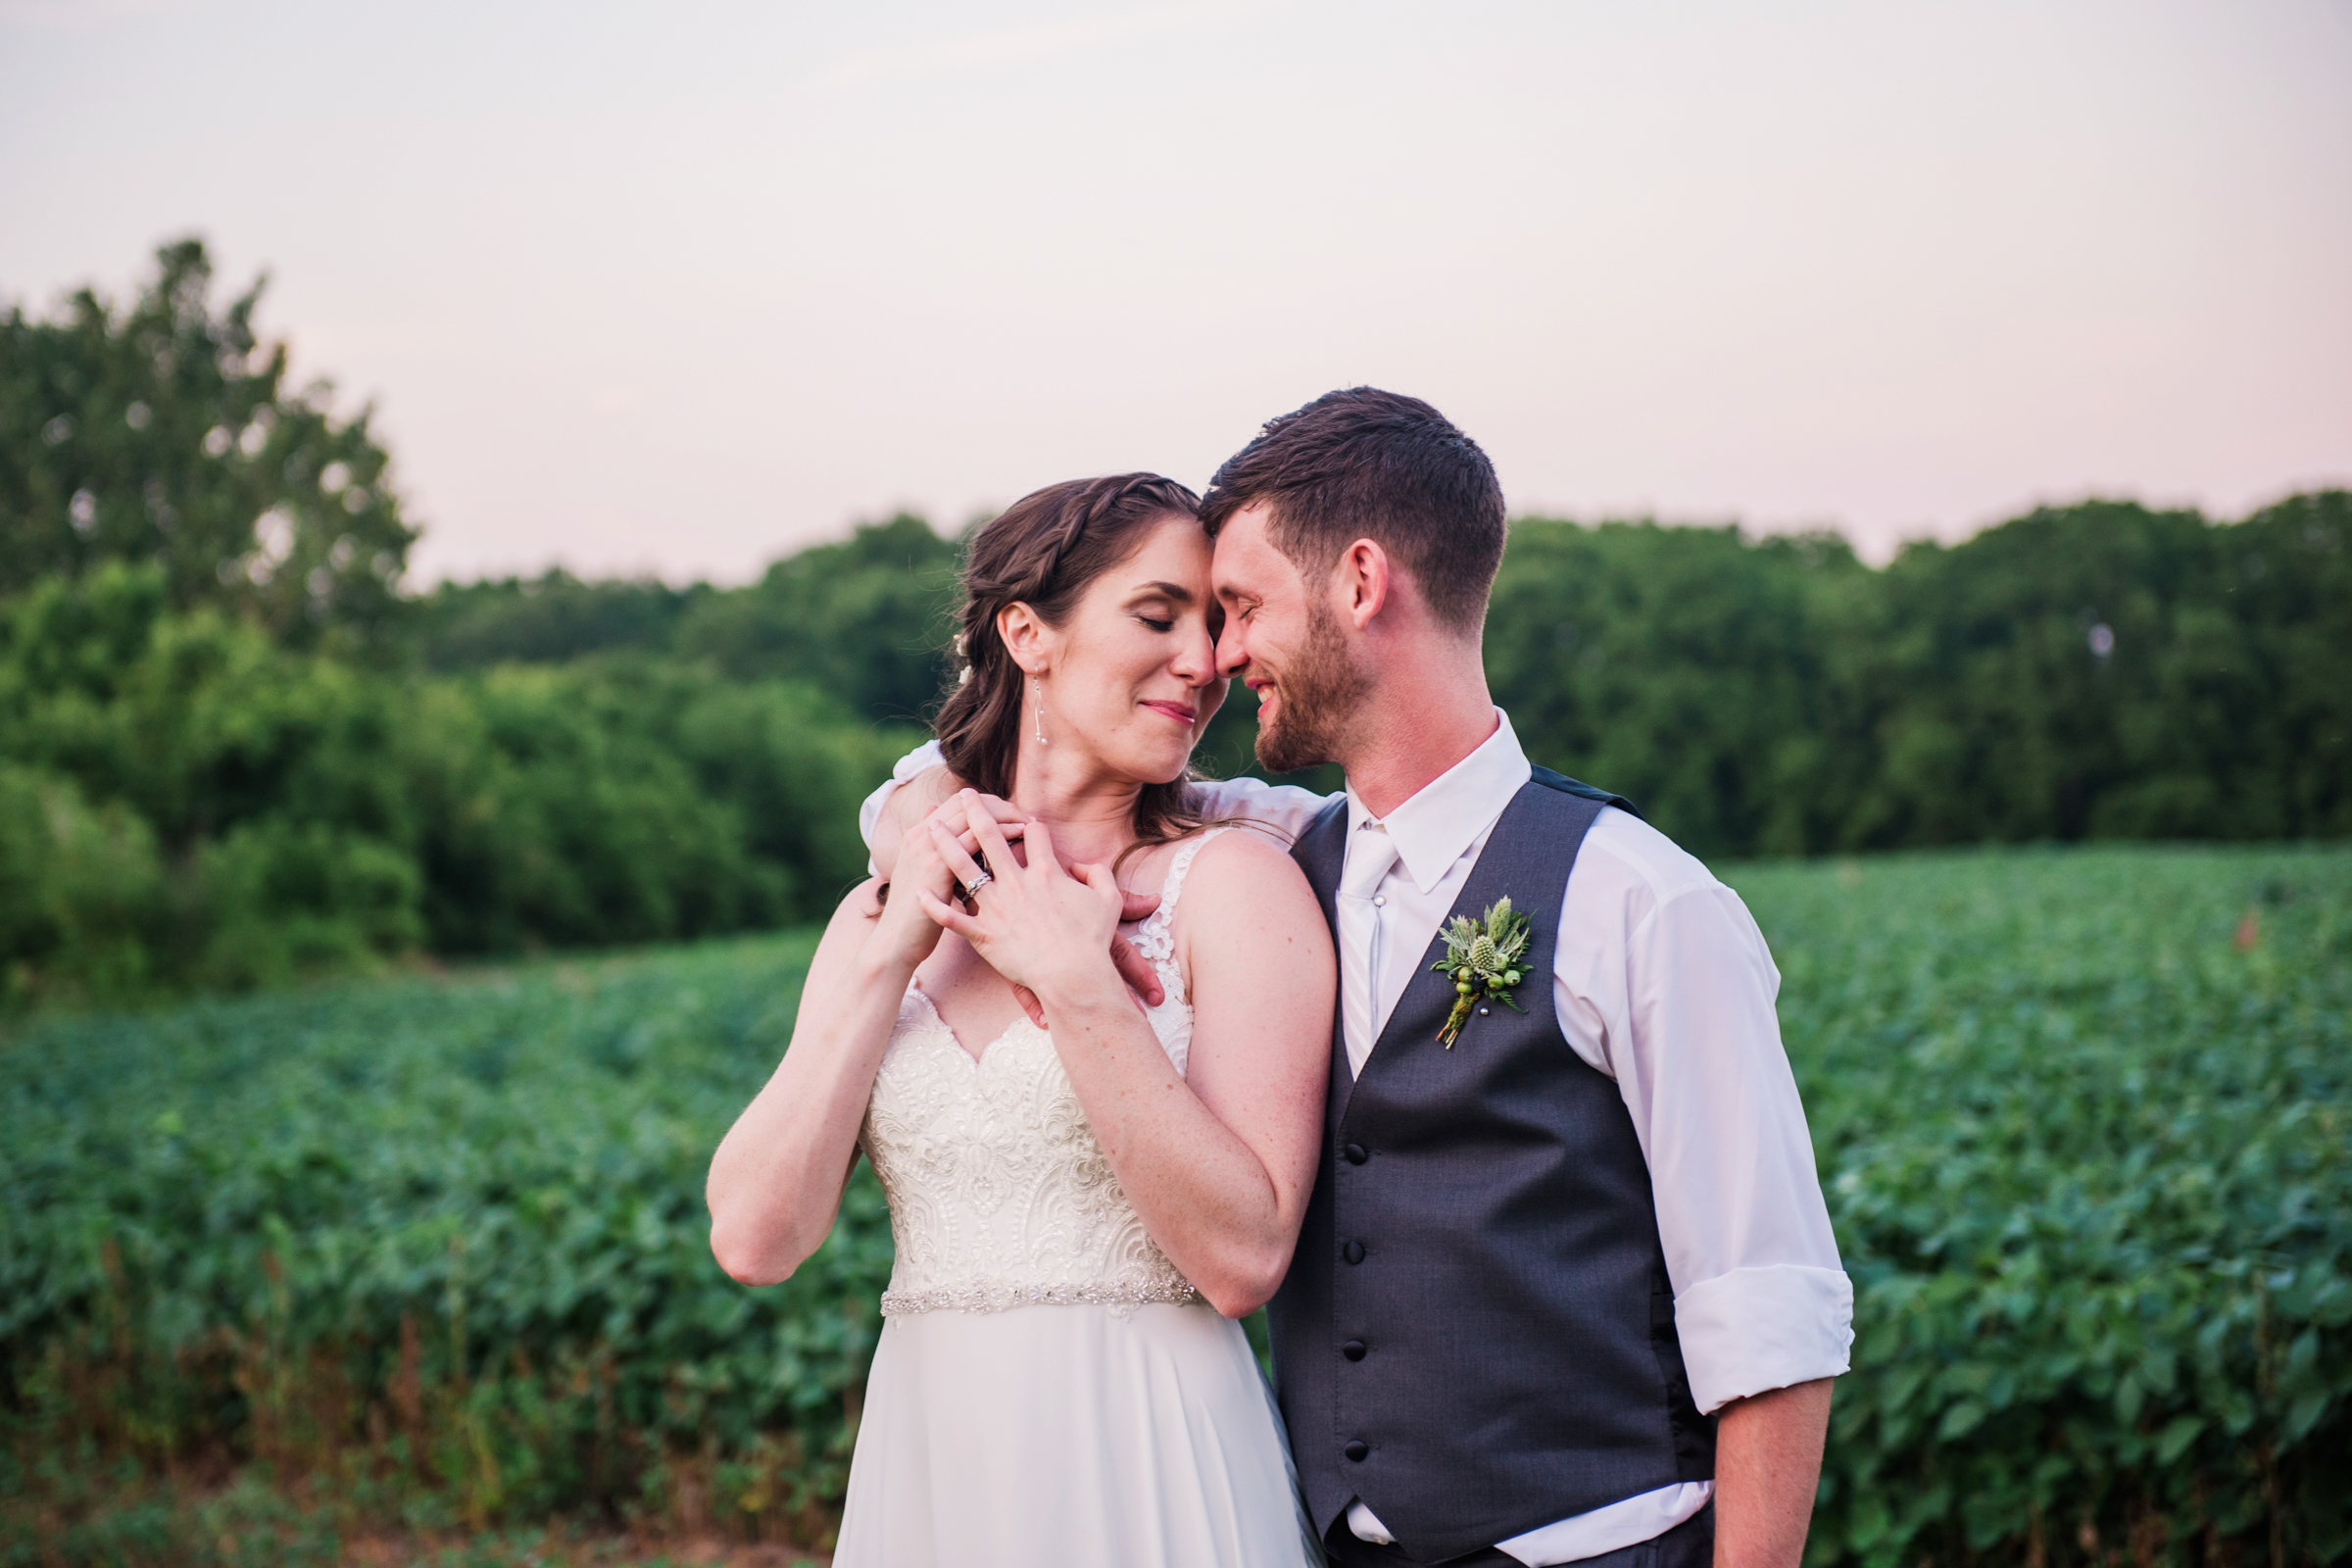 Jerris_Wadsworth_Wedding_Barn_Rochester_Wedding_JILL_STUDIO_Rochester_NY_Photographer_DSC_3149.jpg